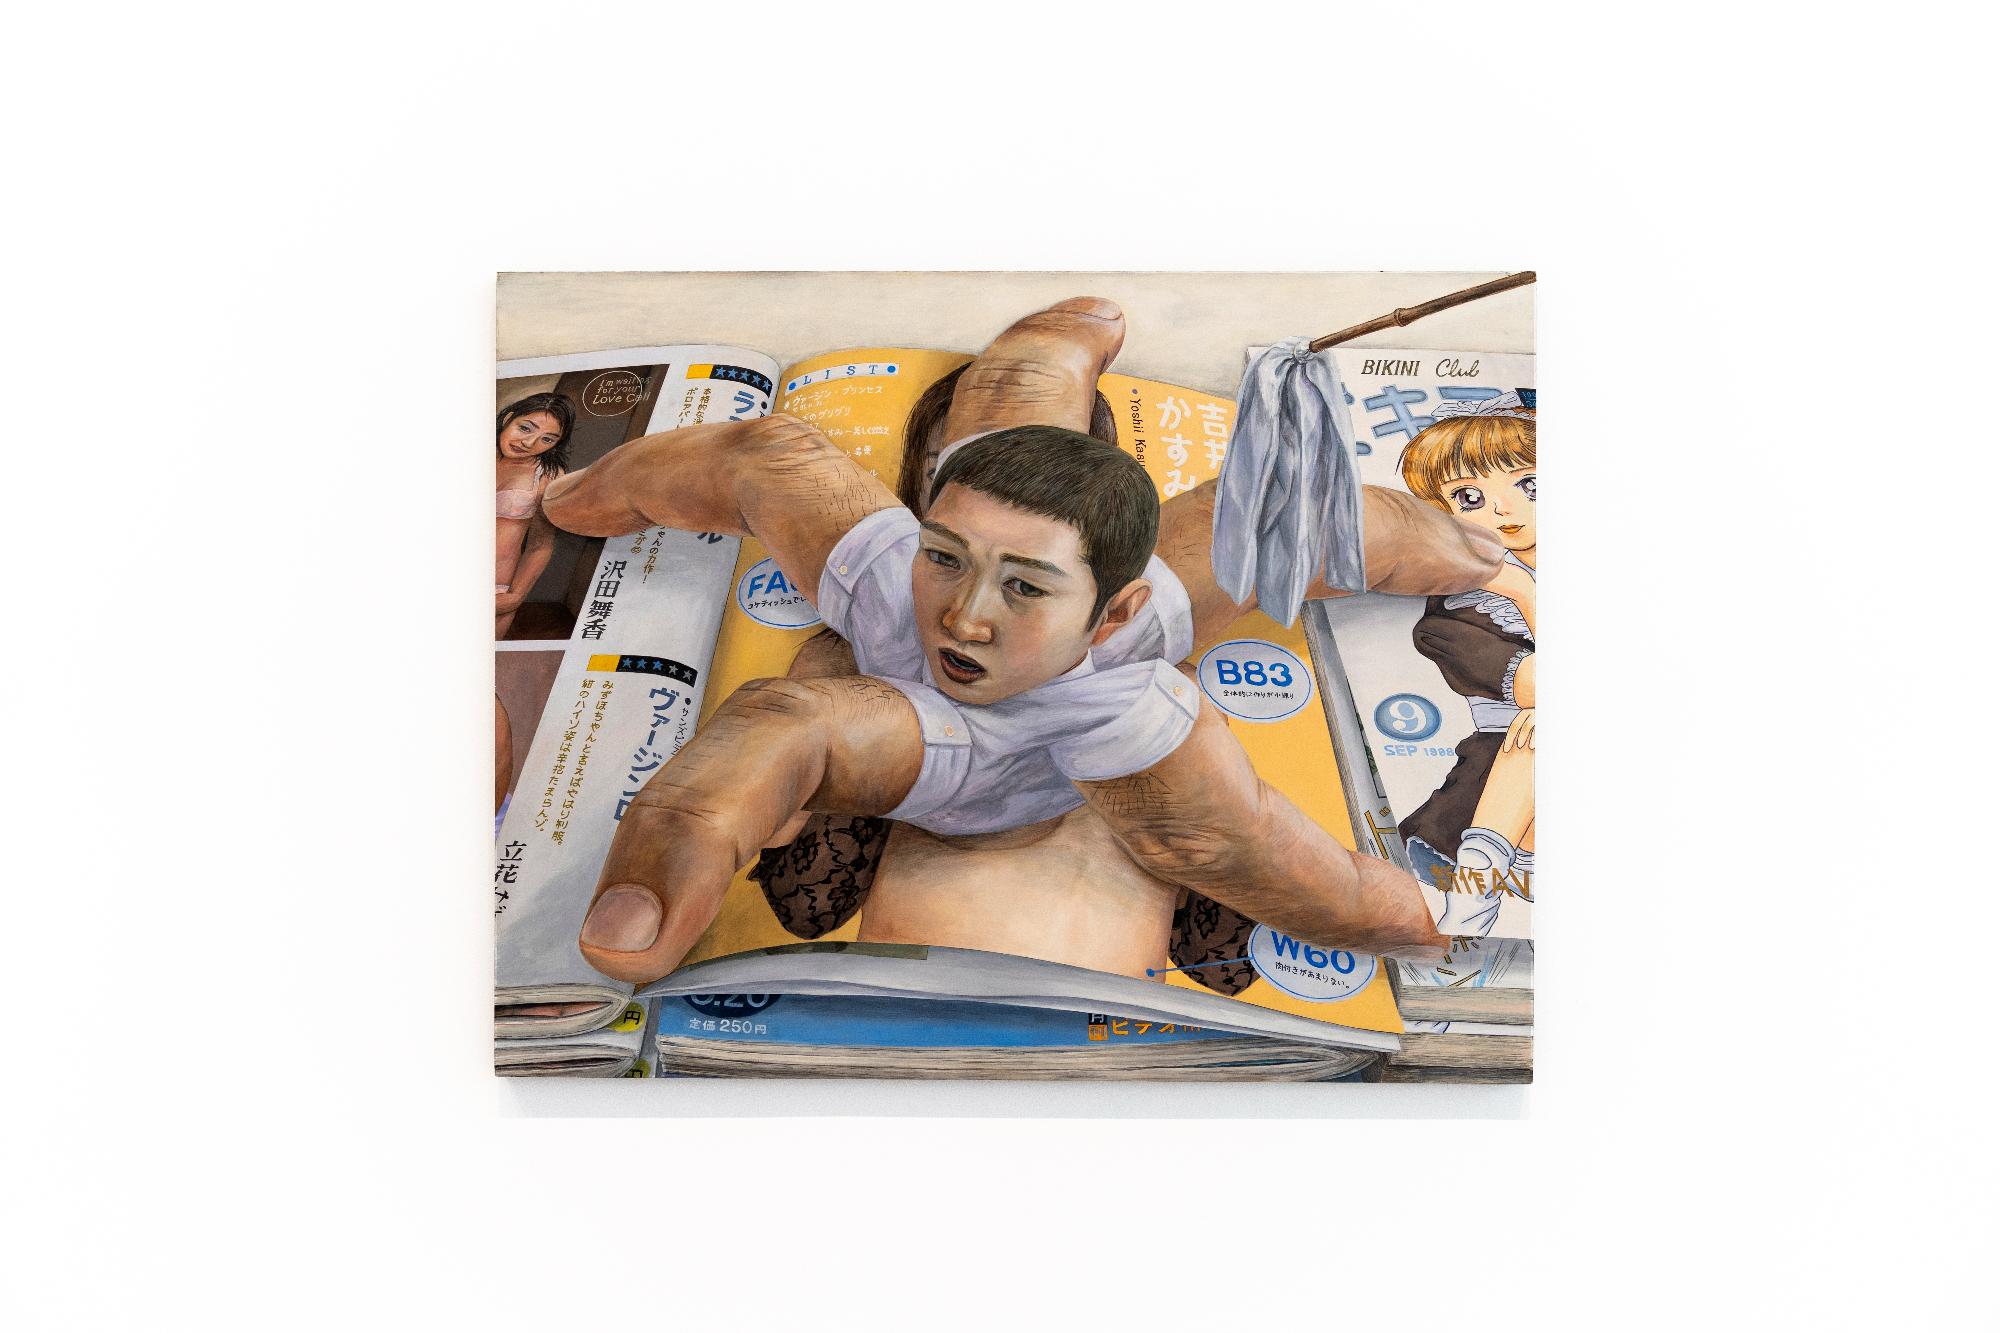 CaballeroCosmica-ExhibitionPhoto-Tetsuya-Ishida-palaciovelazquez-31-p.jpg